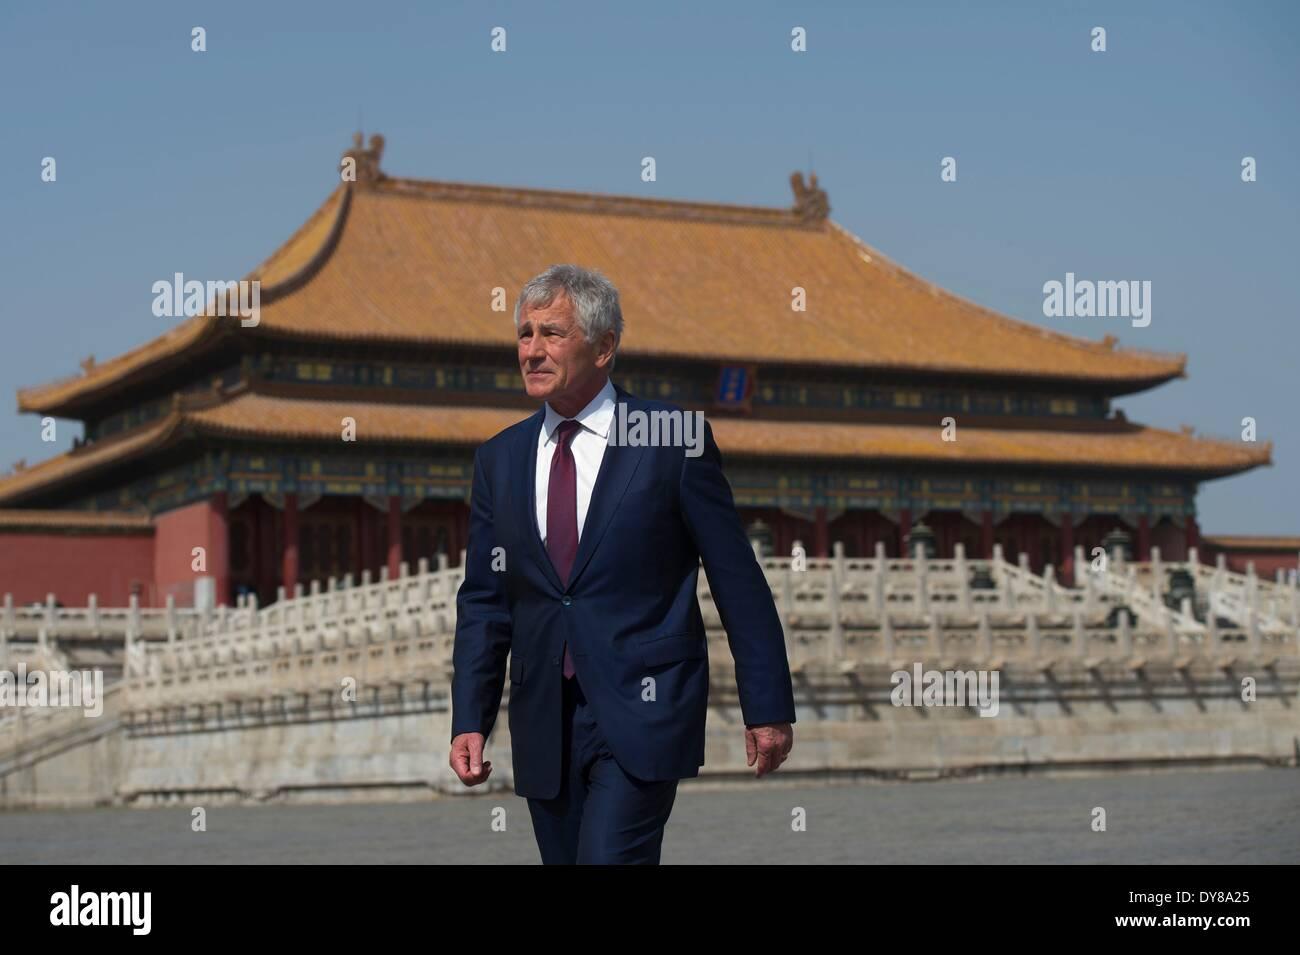 US Secretary of Defense Chuck Hagel tours the Forbidden City April 9, 2014 in Beijing, China. Stock Photo